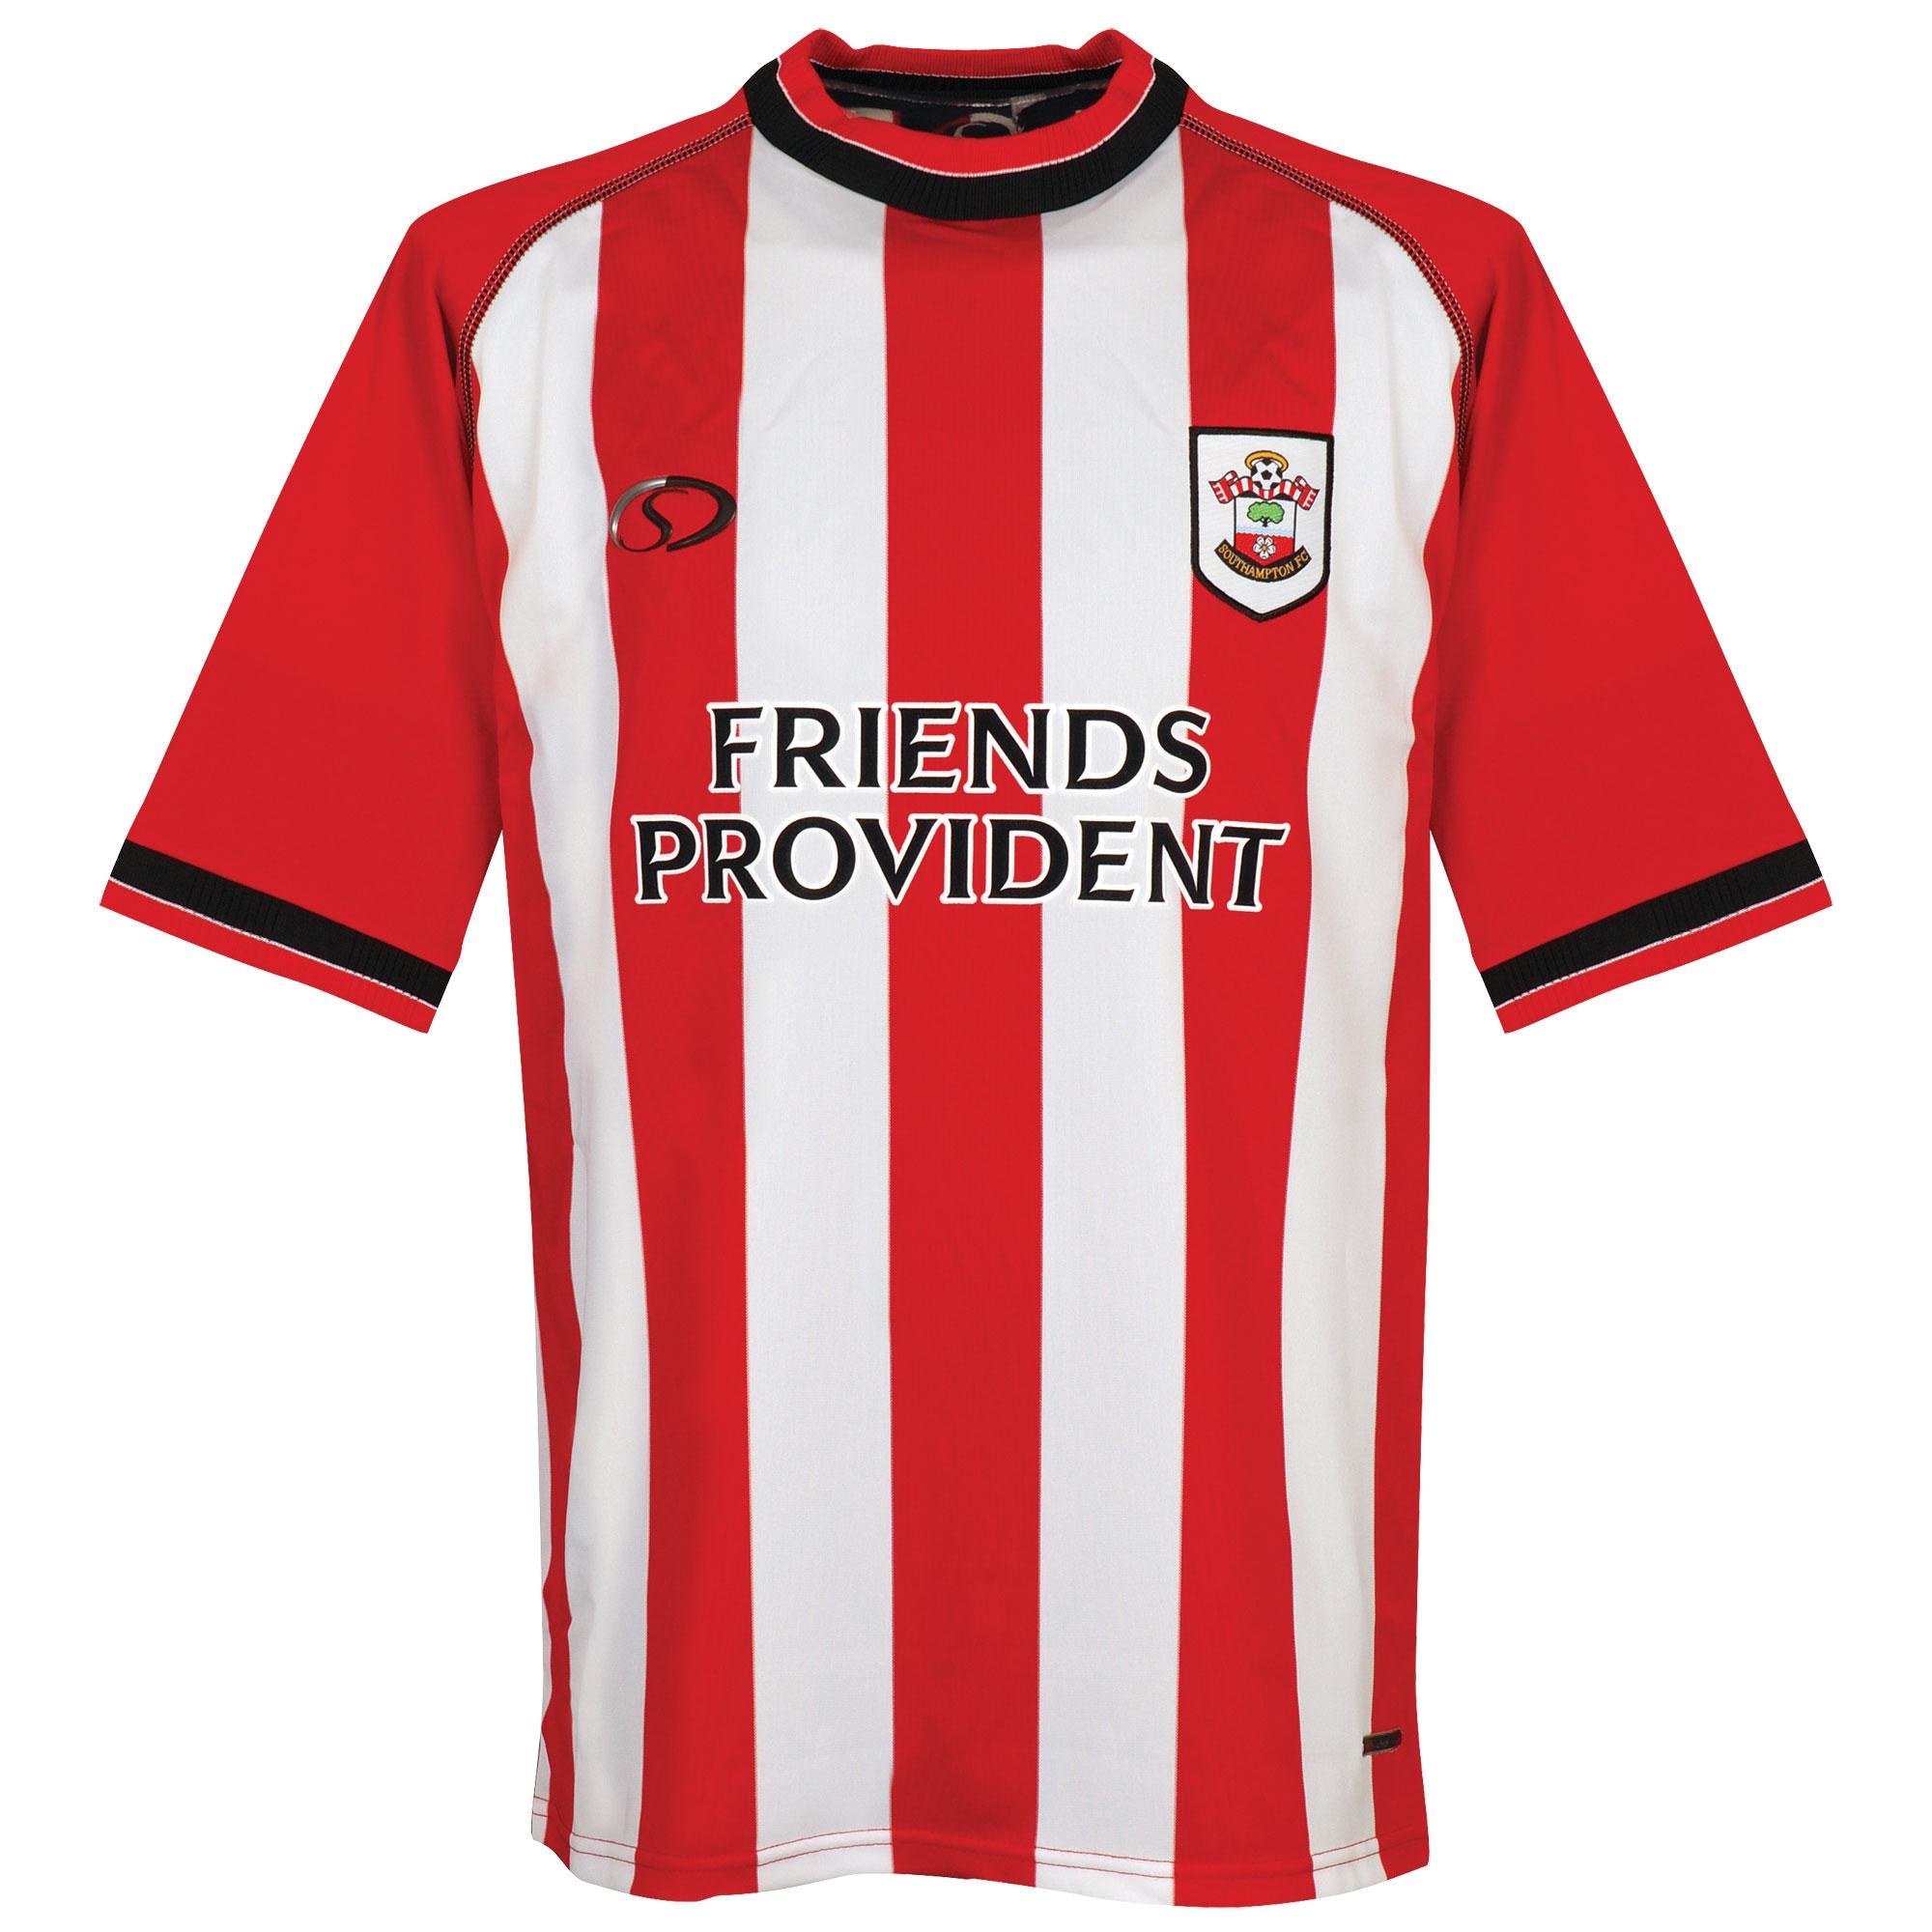 Saints Authentic Southampton 2003-2005 Home Shirt Player Issue (Damaged) - Size XL - XL